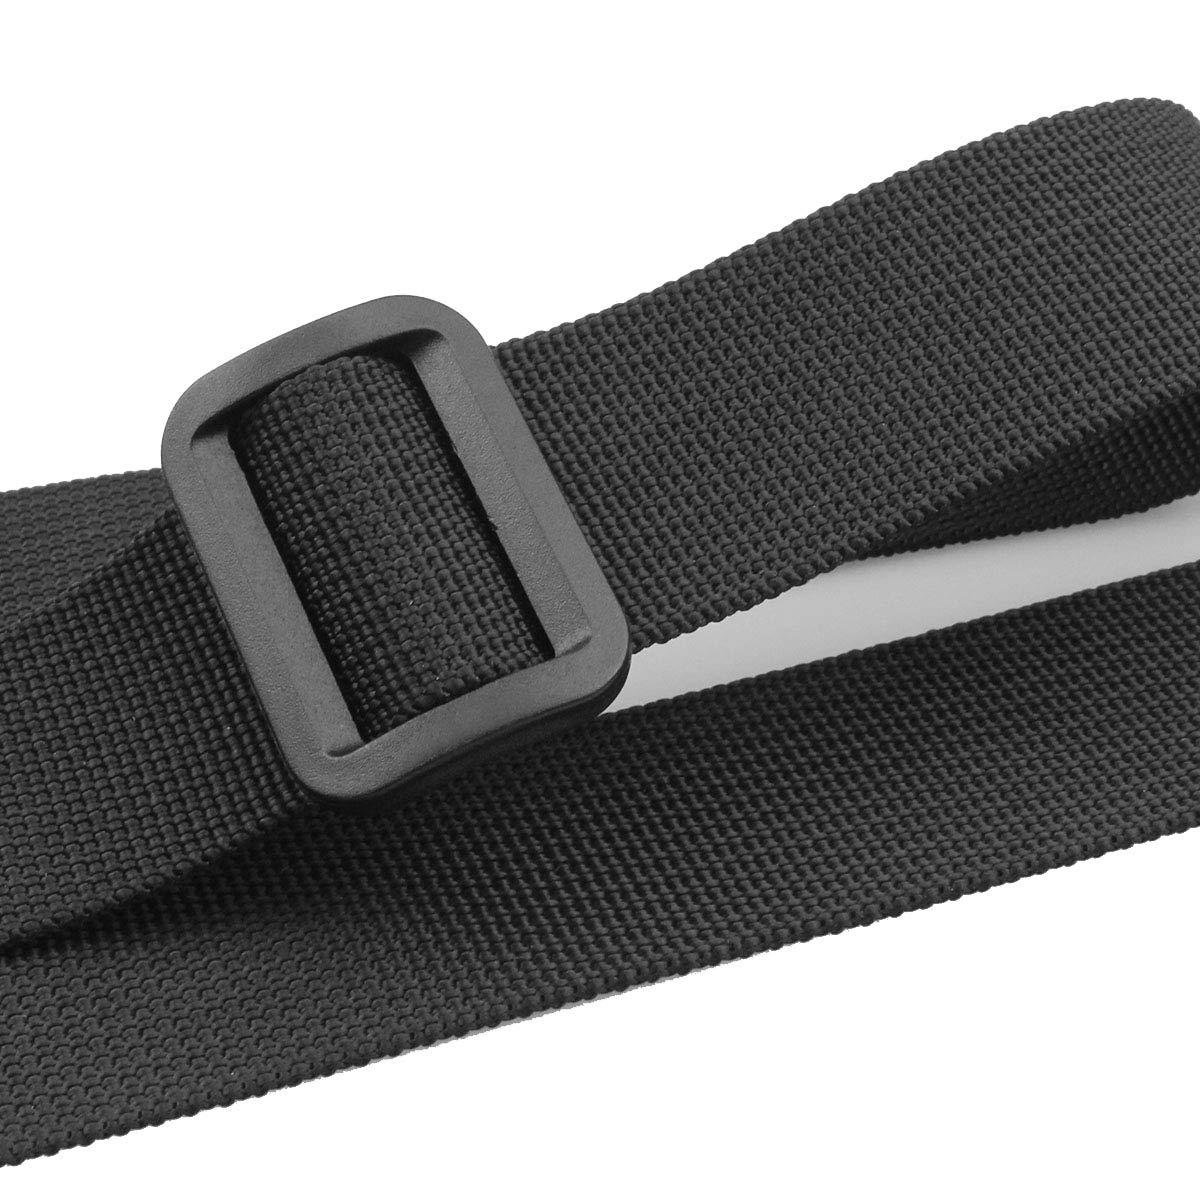 Black Hysagtek 4 Pcs Backpack Chest Strap Adjustable Sternum Strap Backpack Waist Belt with 2 Pcs Replacement Buckles for Hiking and Jogging 2.5cm// 1inch